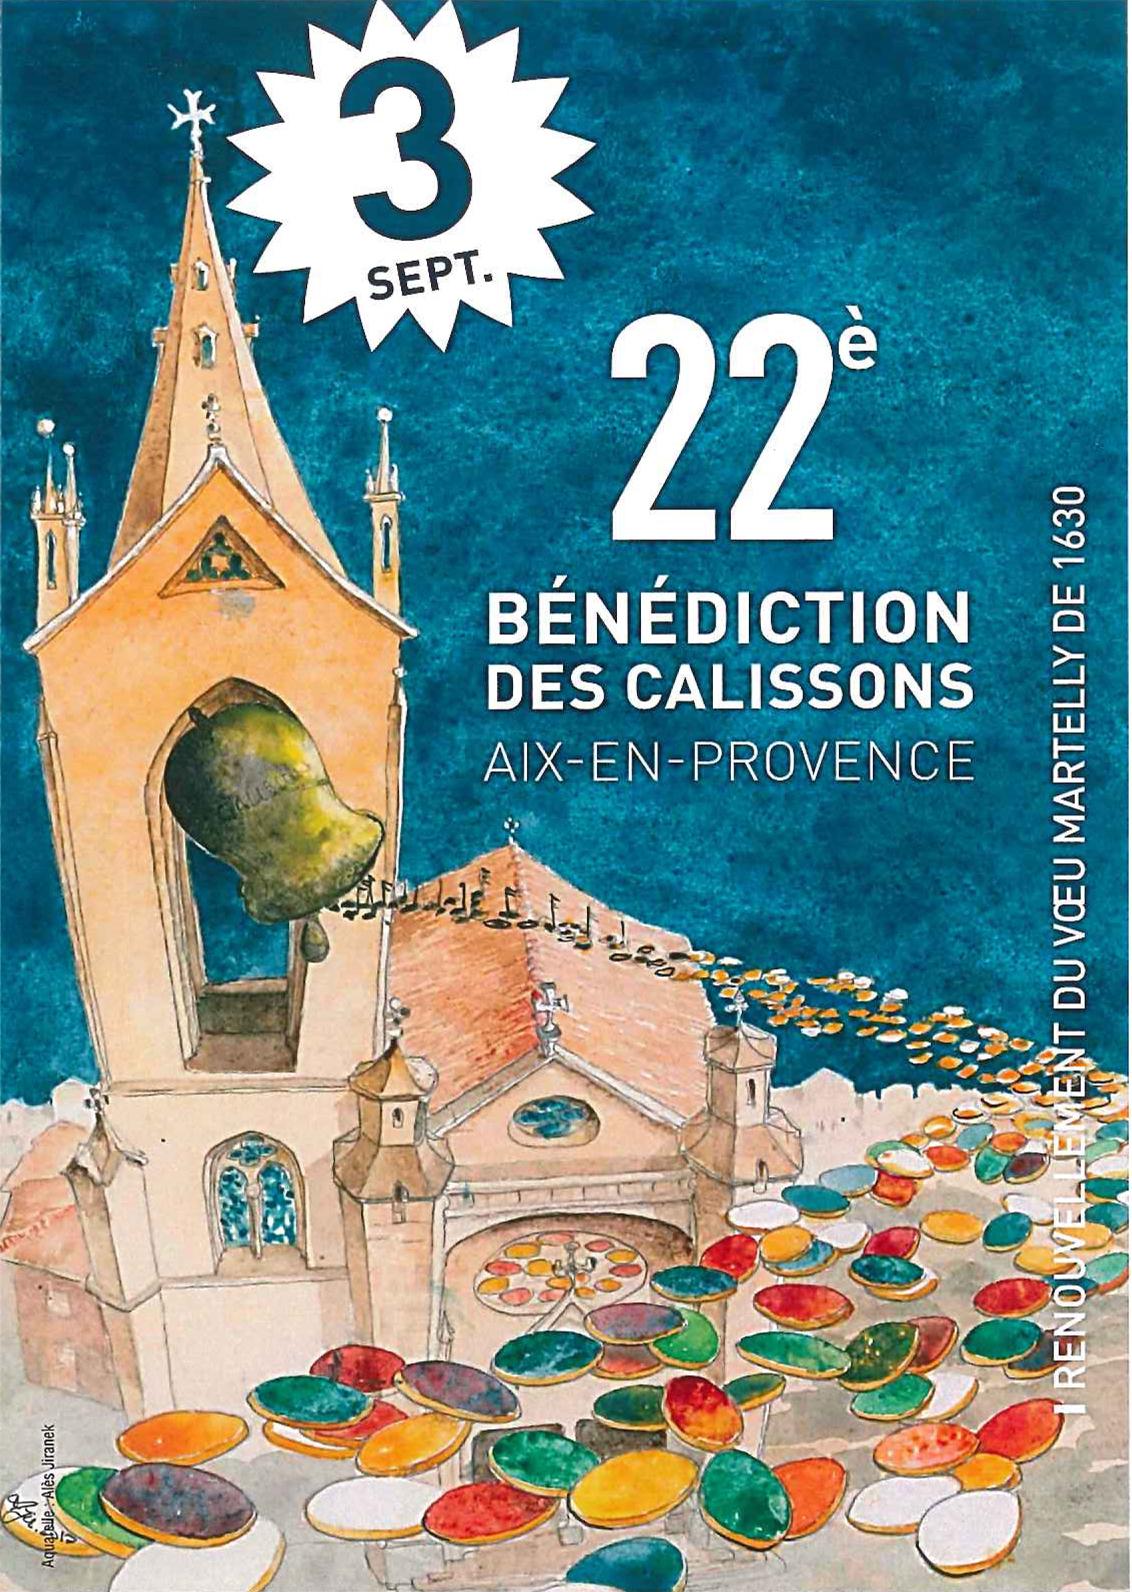 22e Benediction Calissons